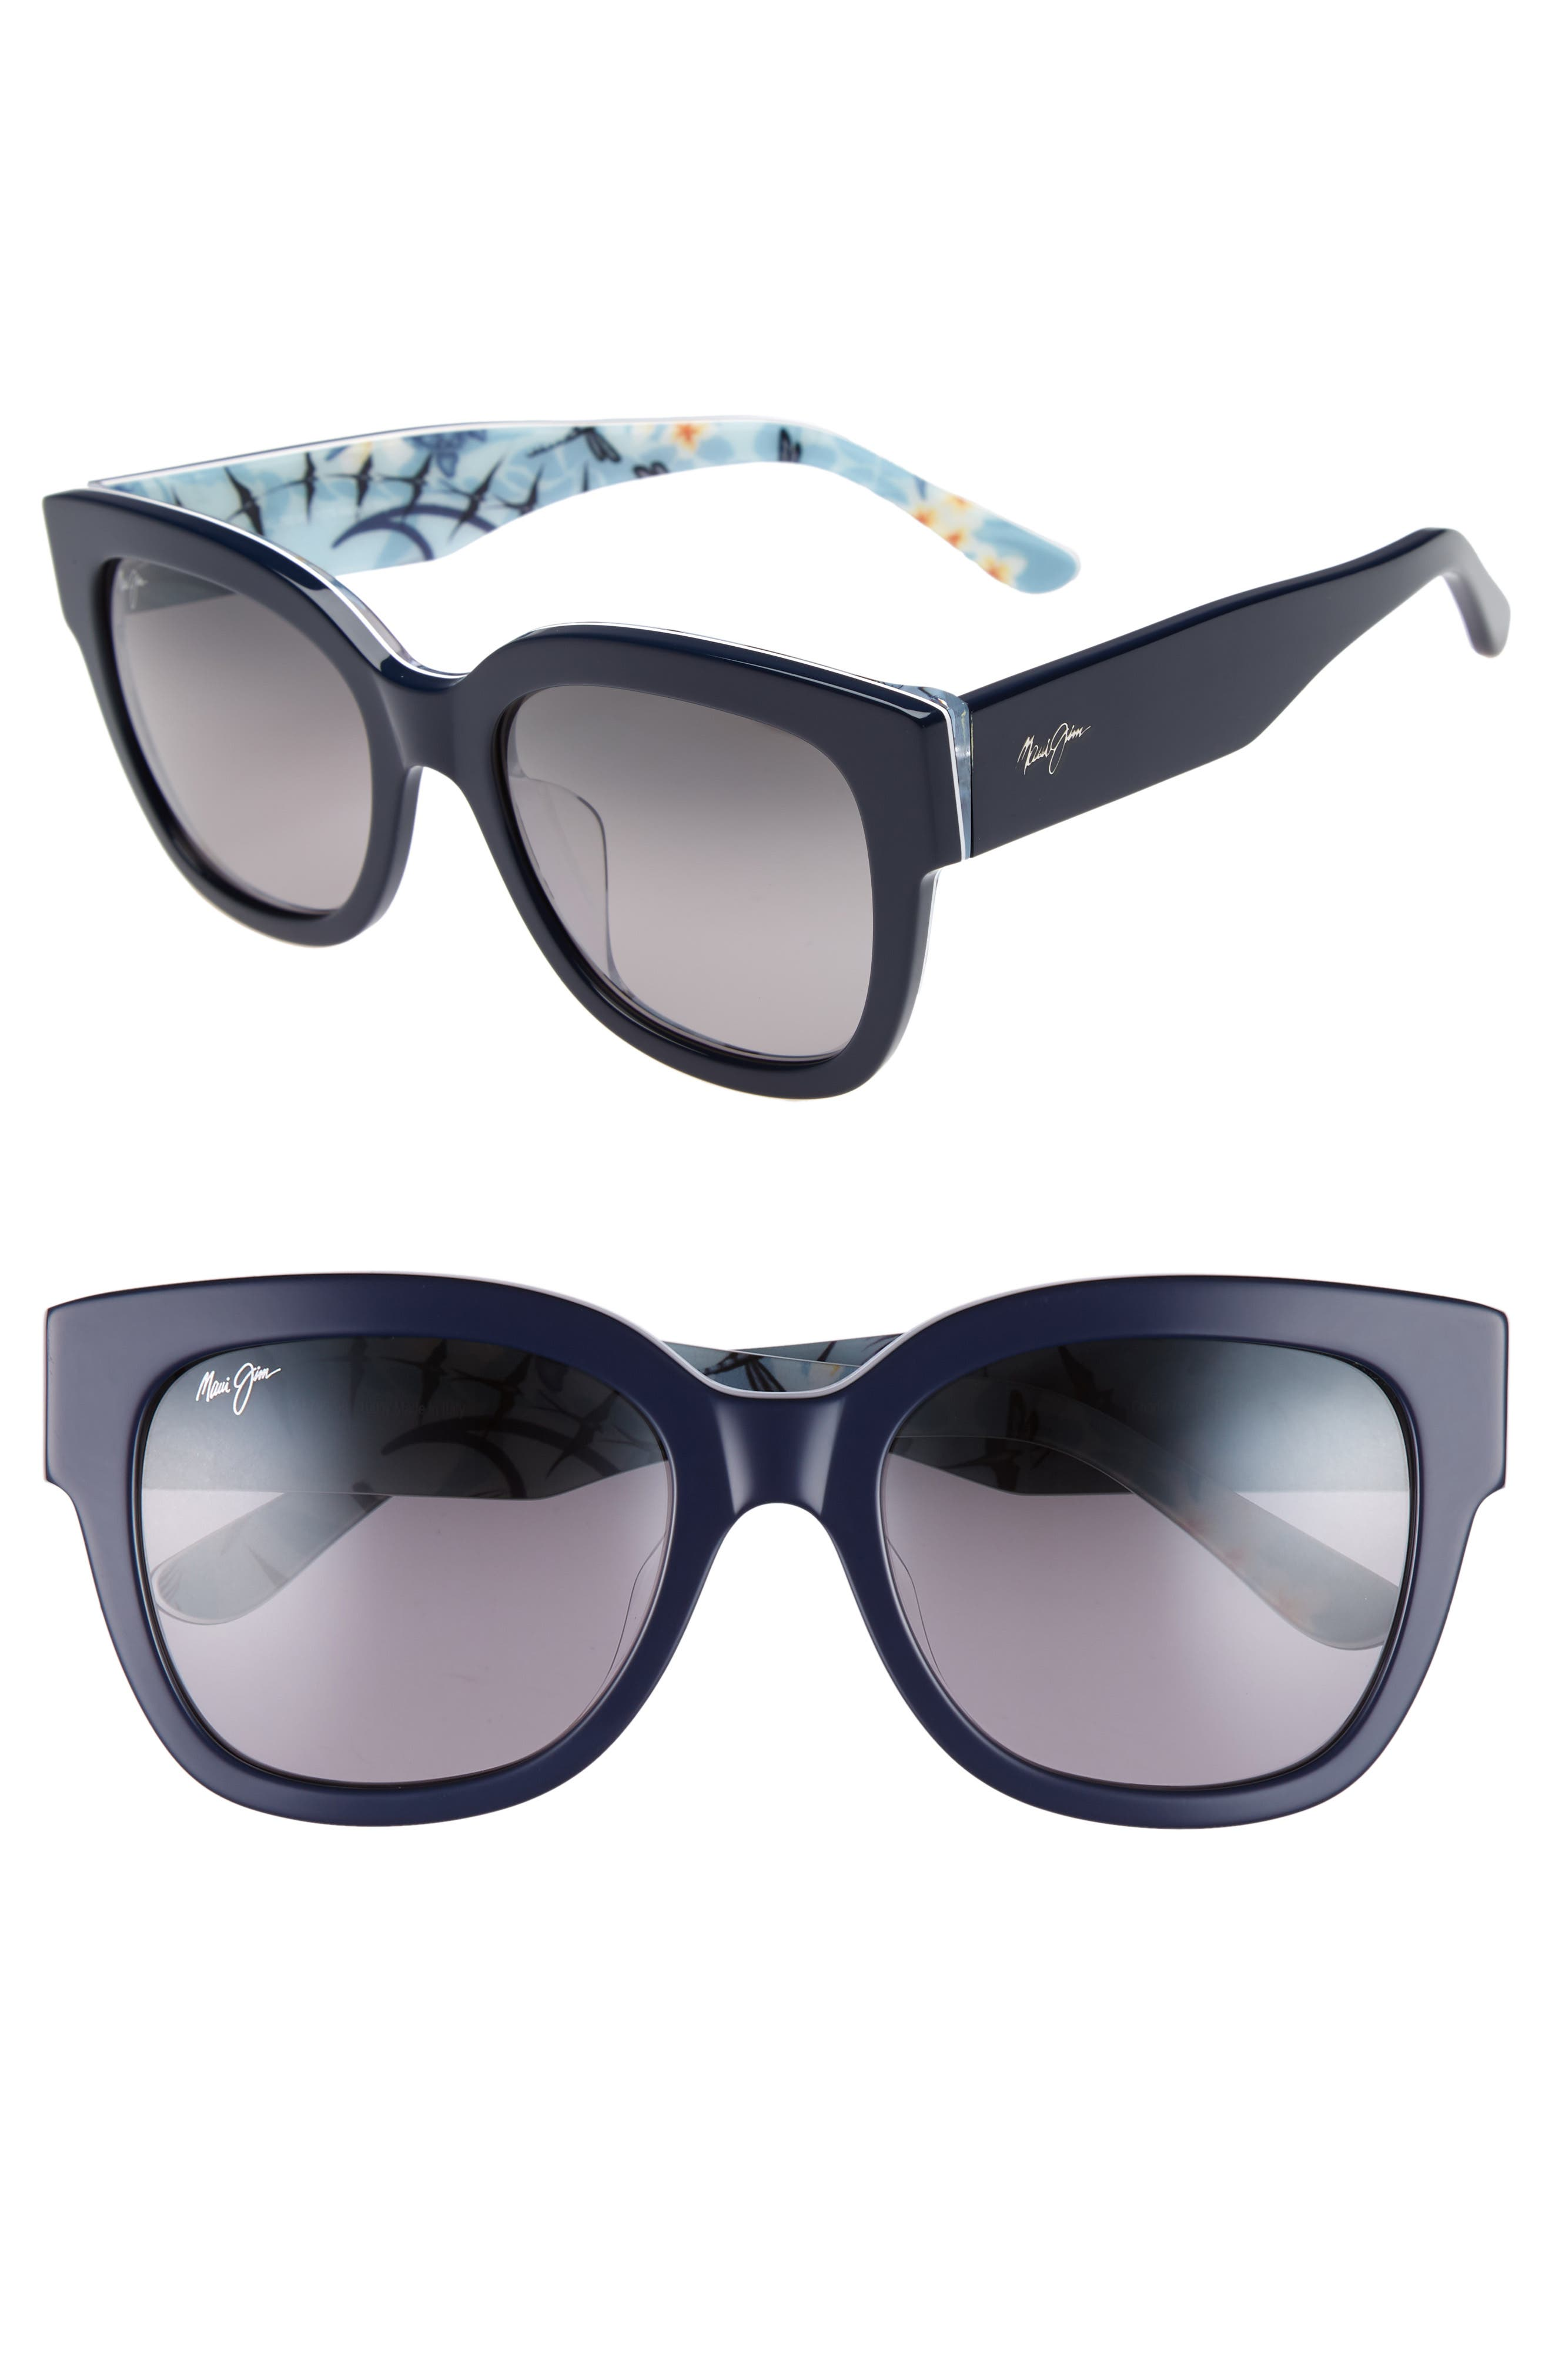 Maui Jim 54mm Rhythm Polarized Sunglasses